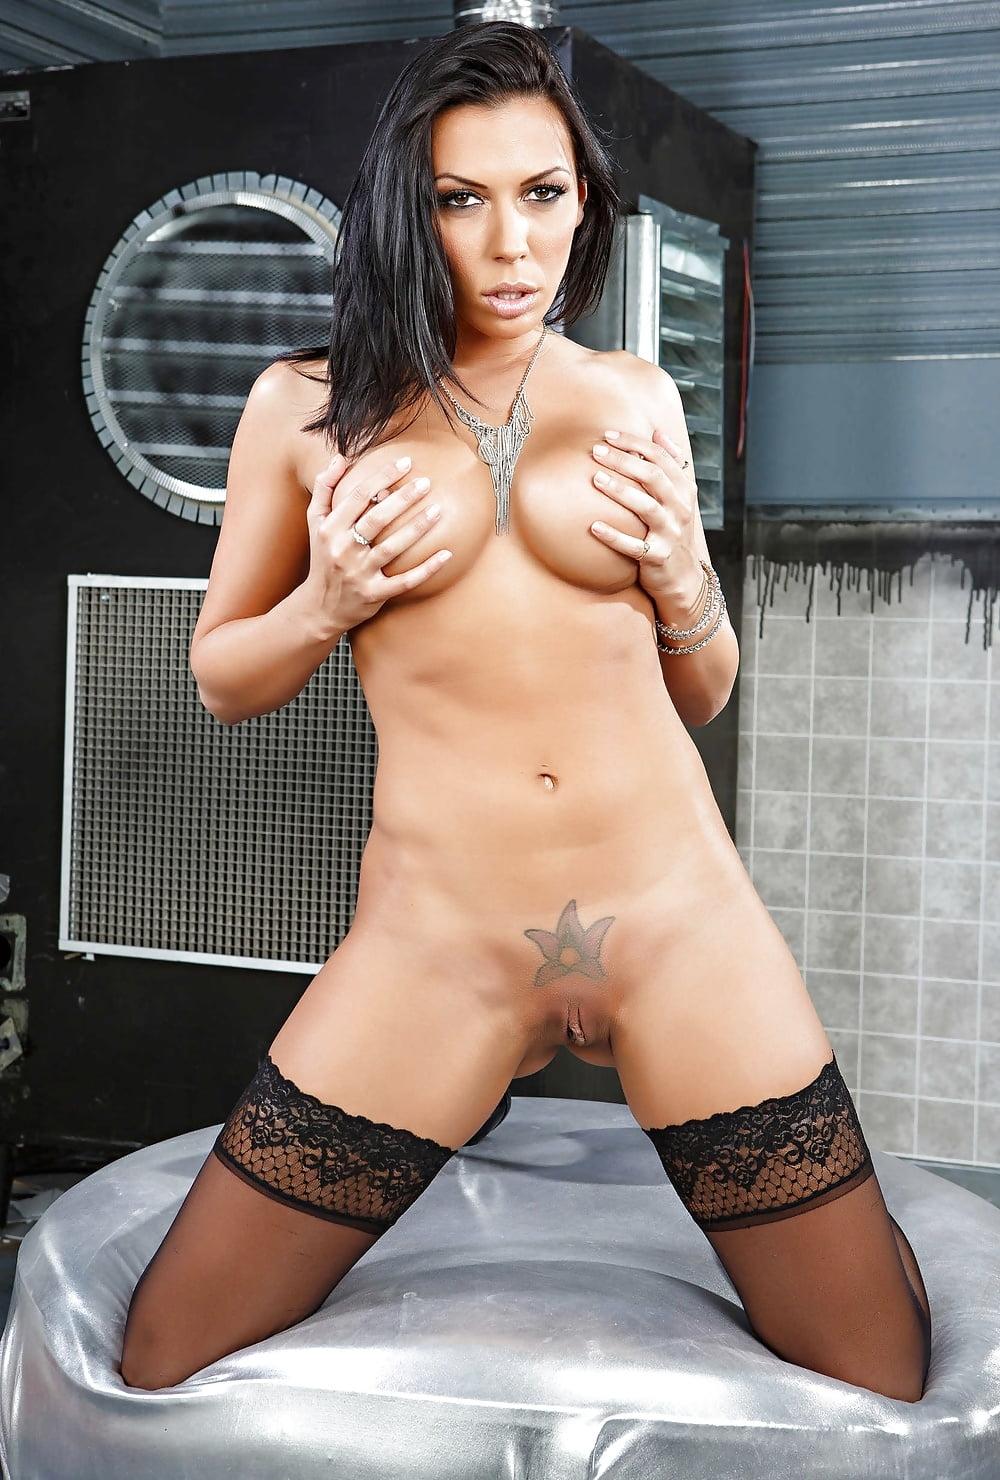 Rachel starr jake nude 5